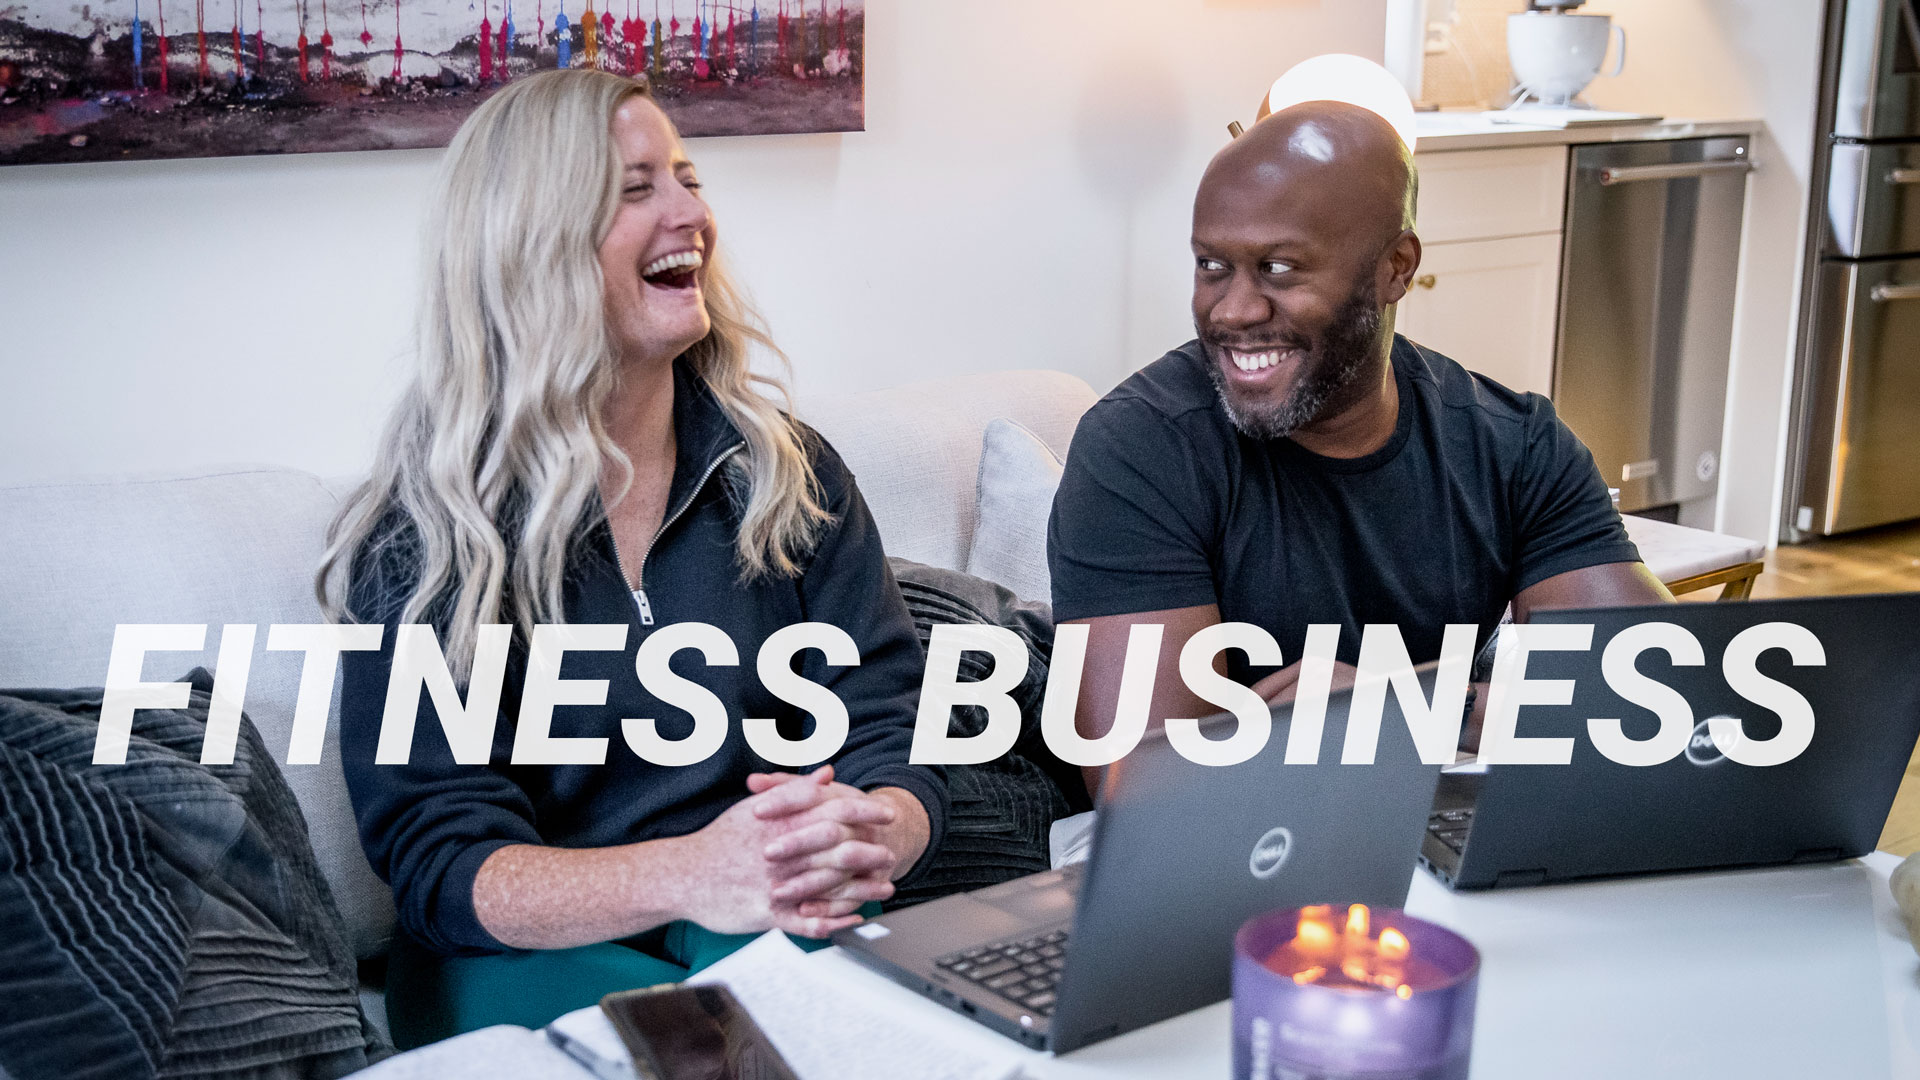 people having business conversations